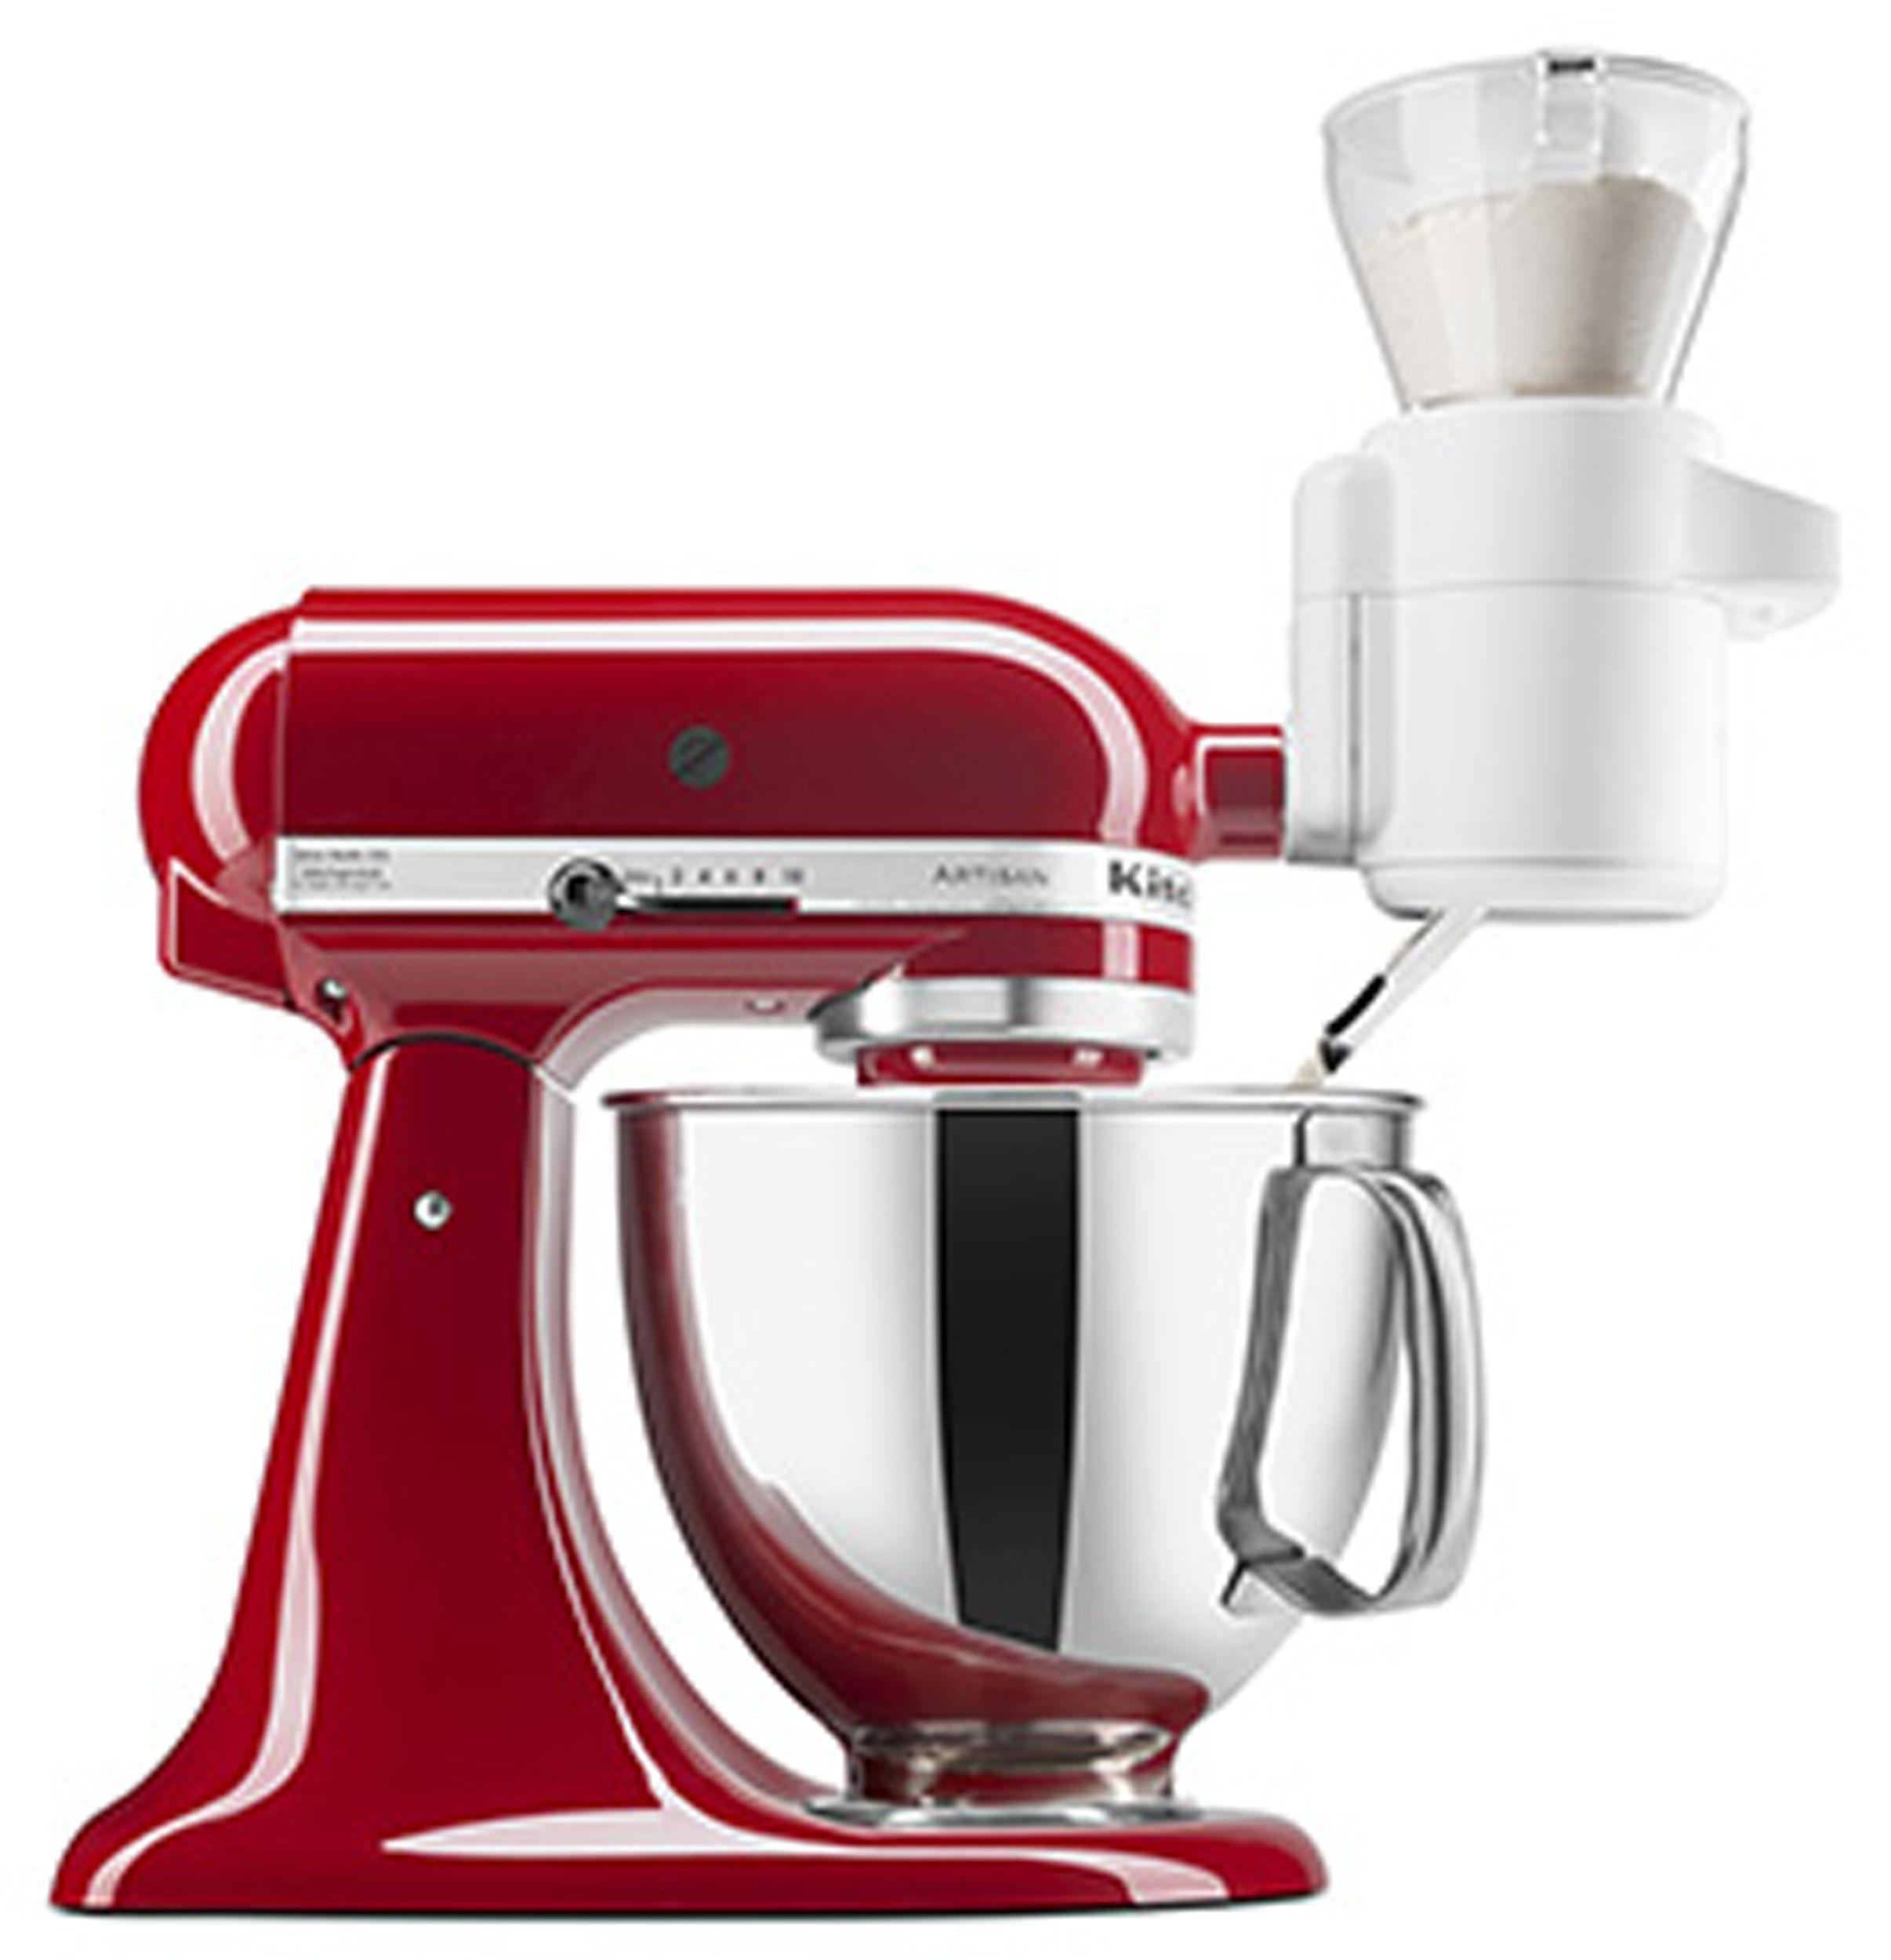 Kitchenaid ksmsfta sifter and scale mixer attachment